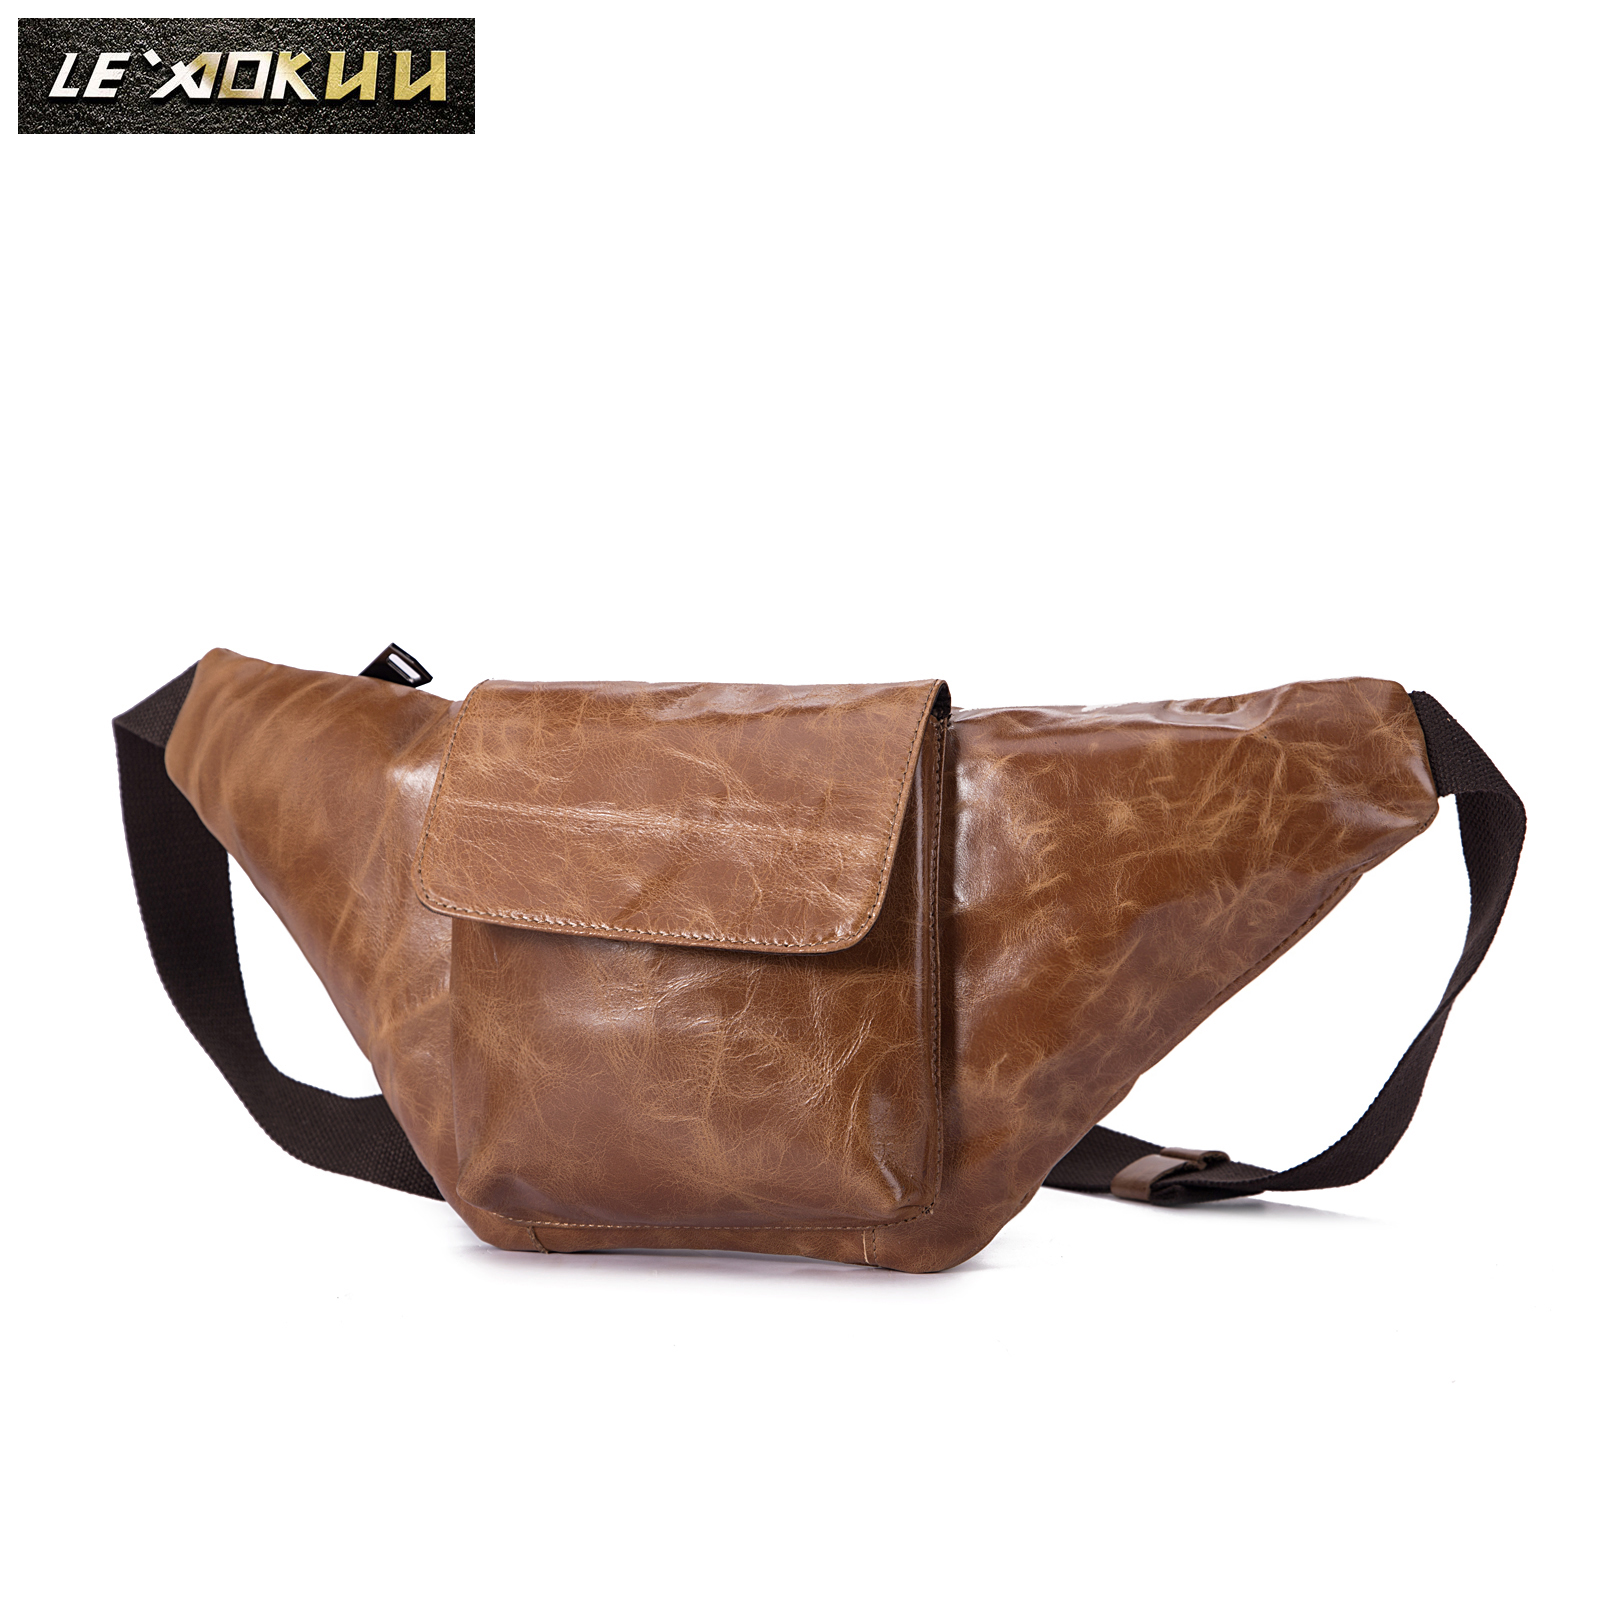 New Quality Leather Men Casual Fashion Travel Fanny Waist Belt Bag Chest Pack Sling Bag Design Phone Cigarette Case Male 2022